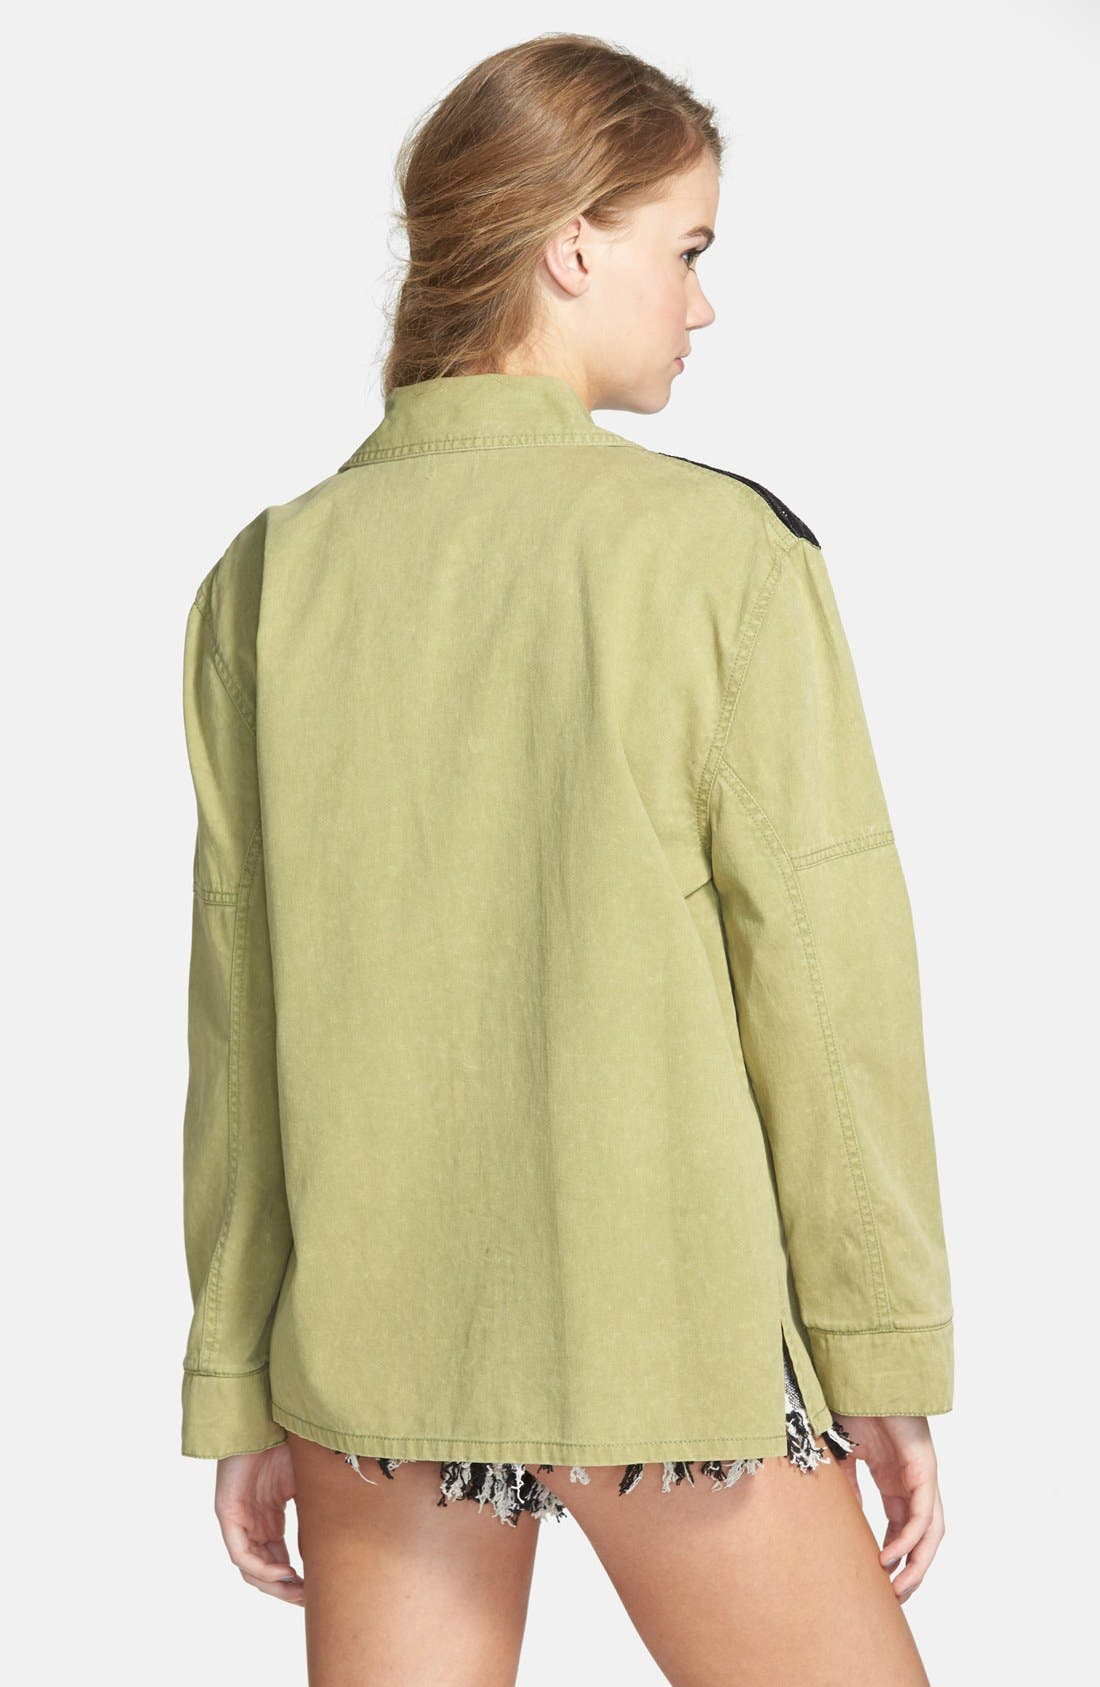 'Marooned' High Waist Woven Shorts,                             Alternate thumbnail 2, color,                             900